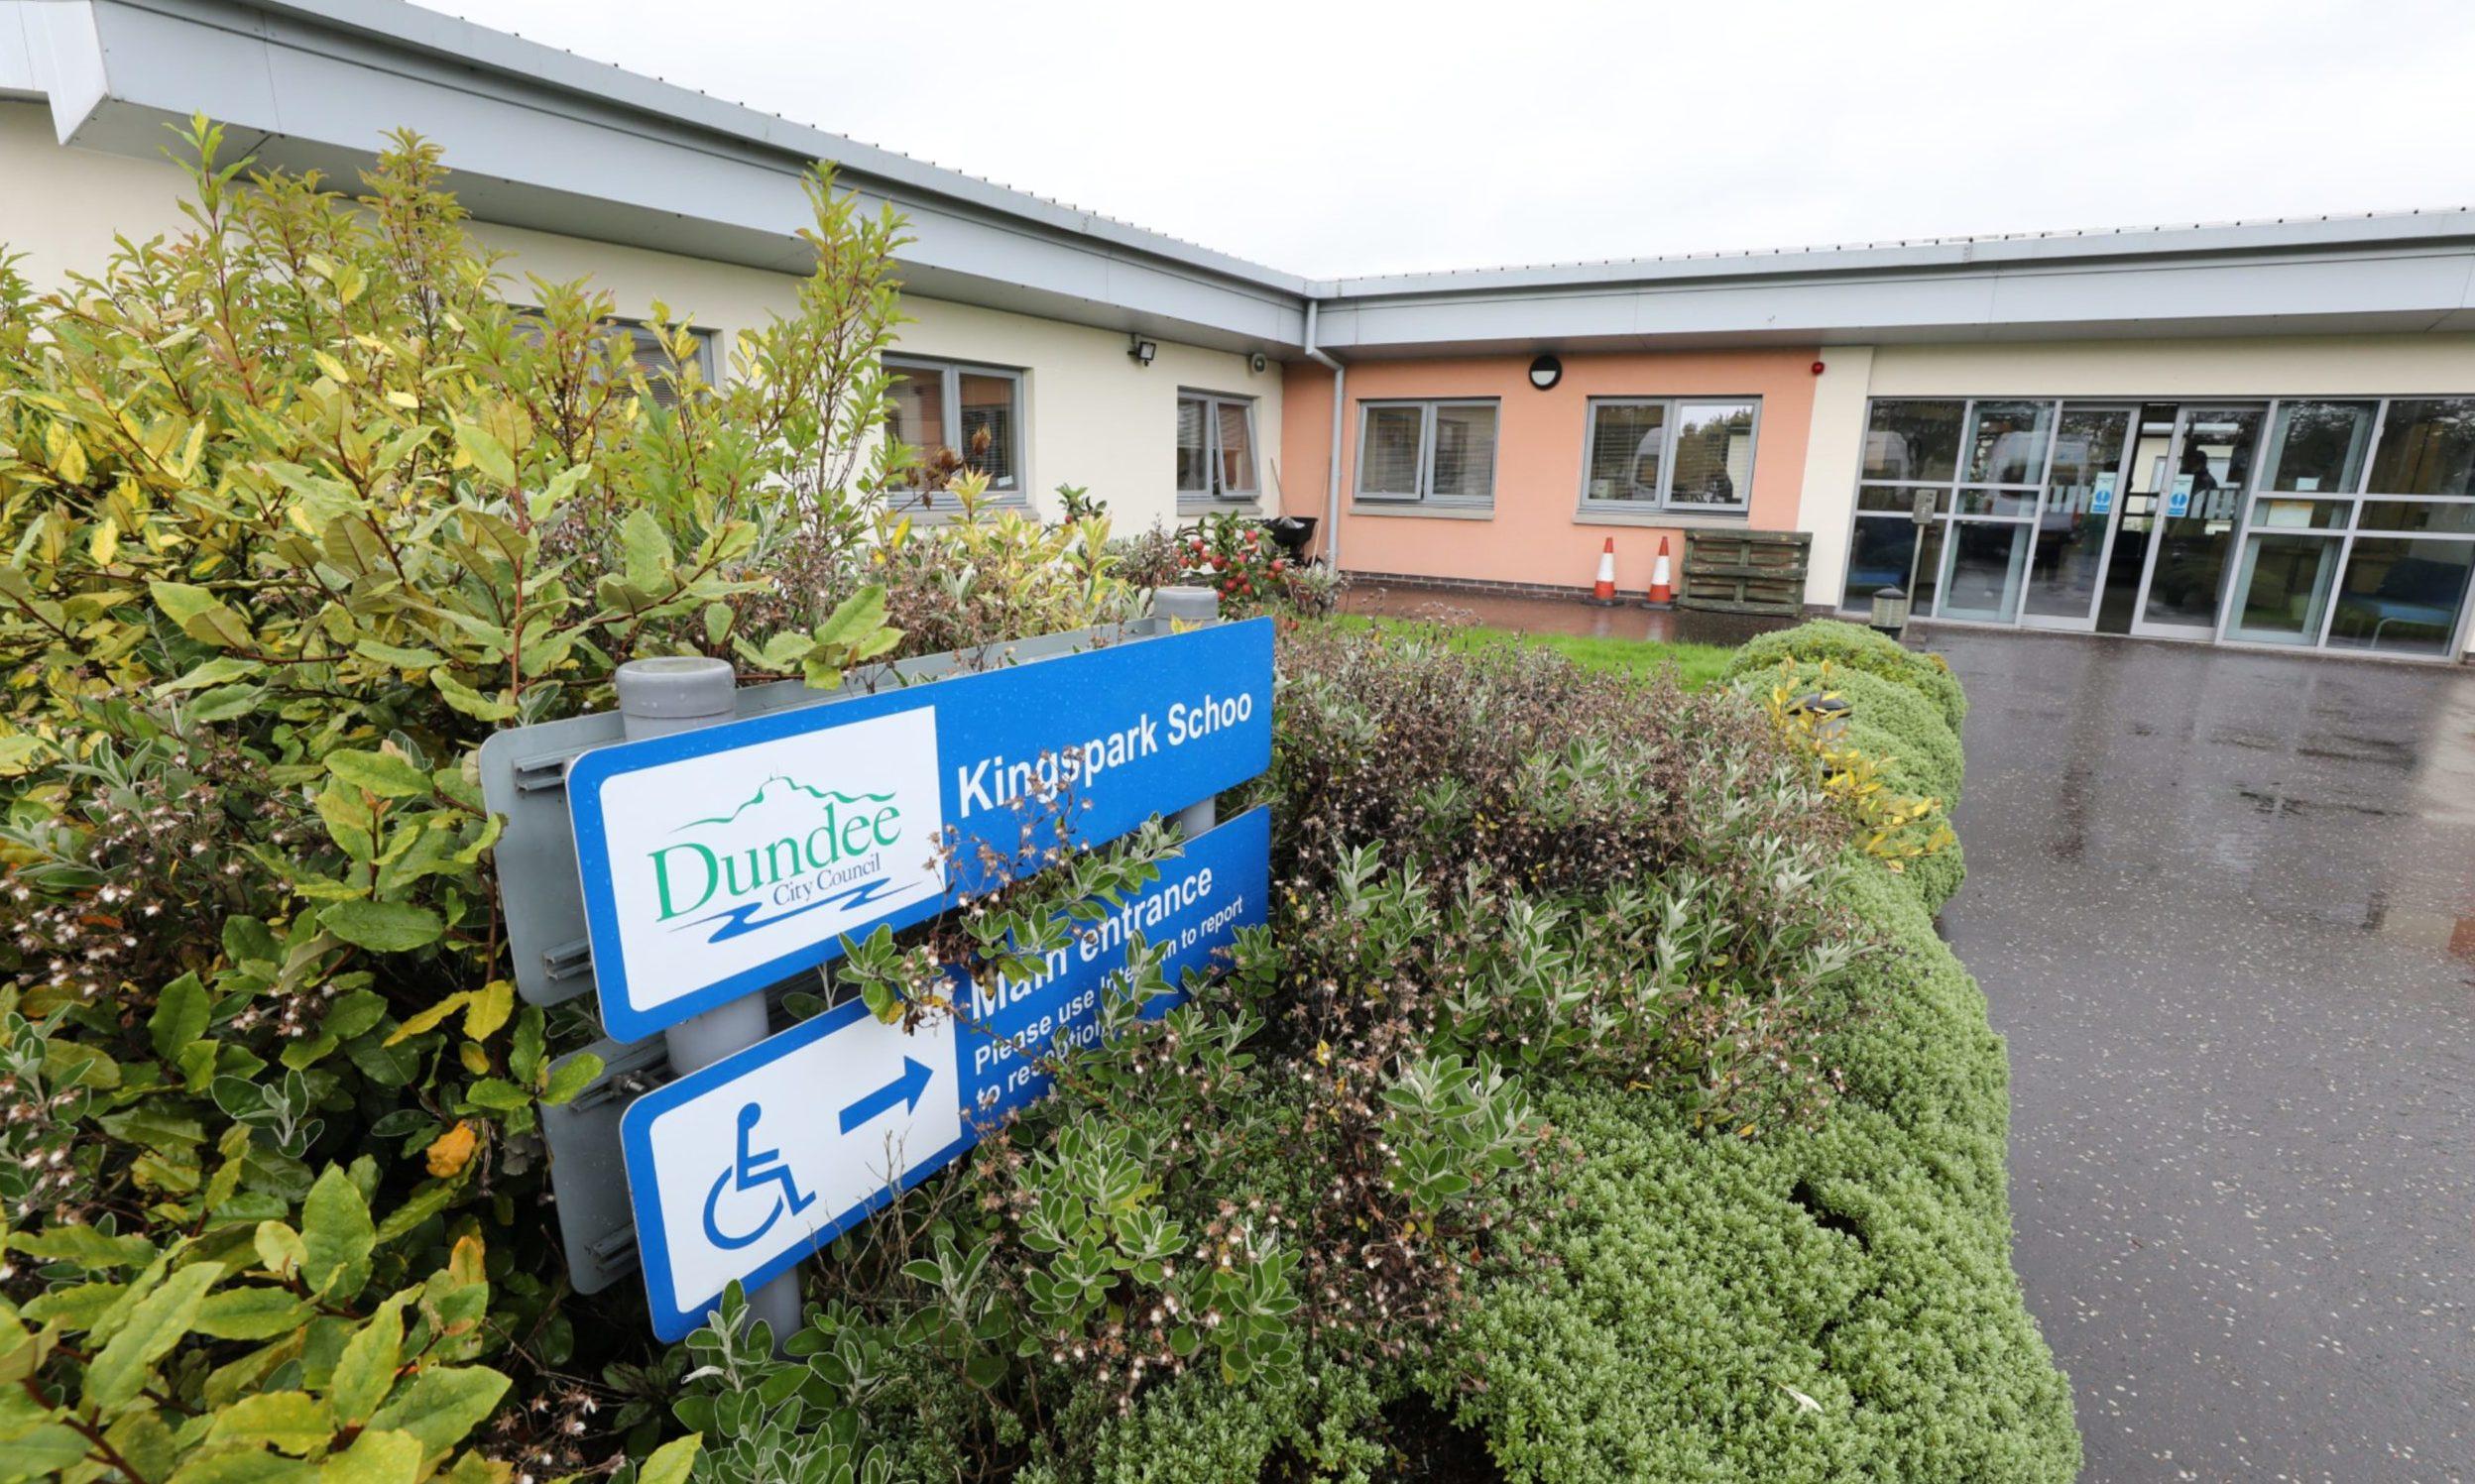 Kingspark School in Dundee.